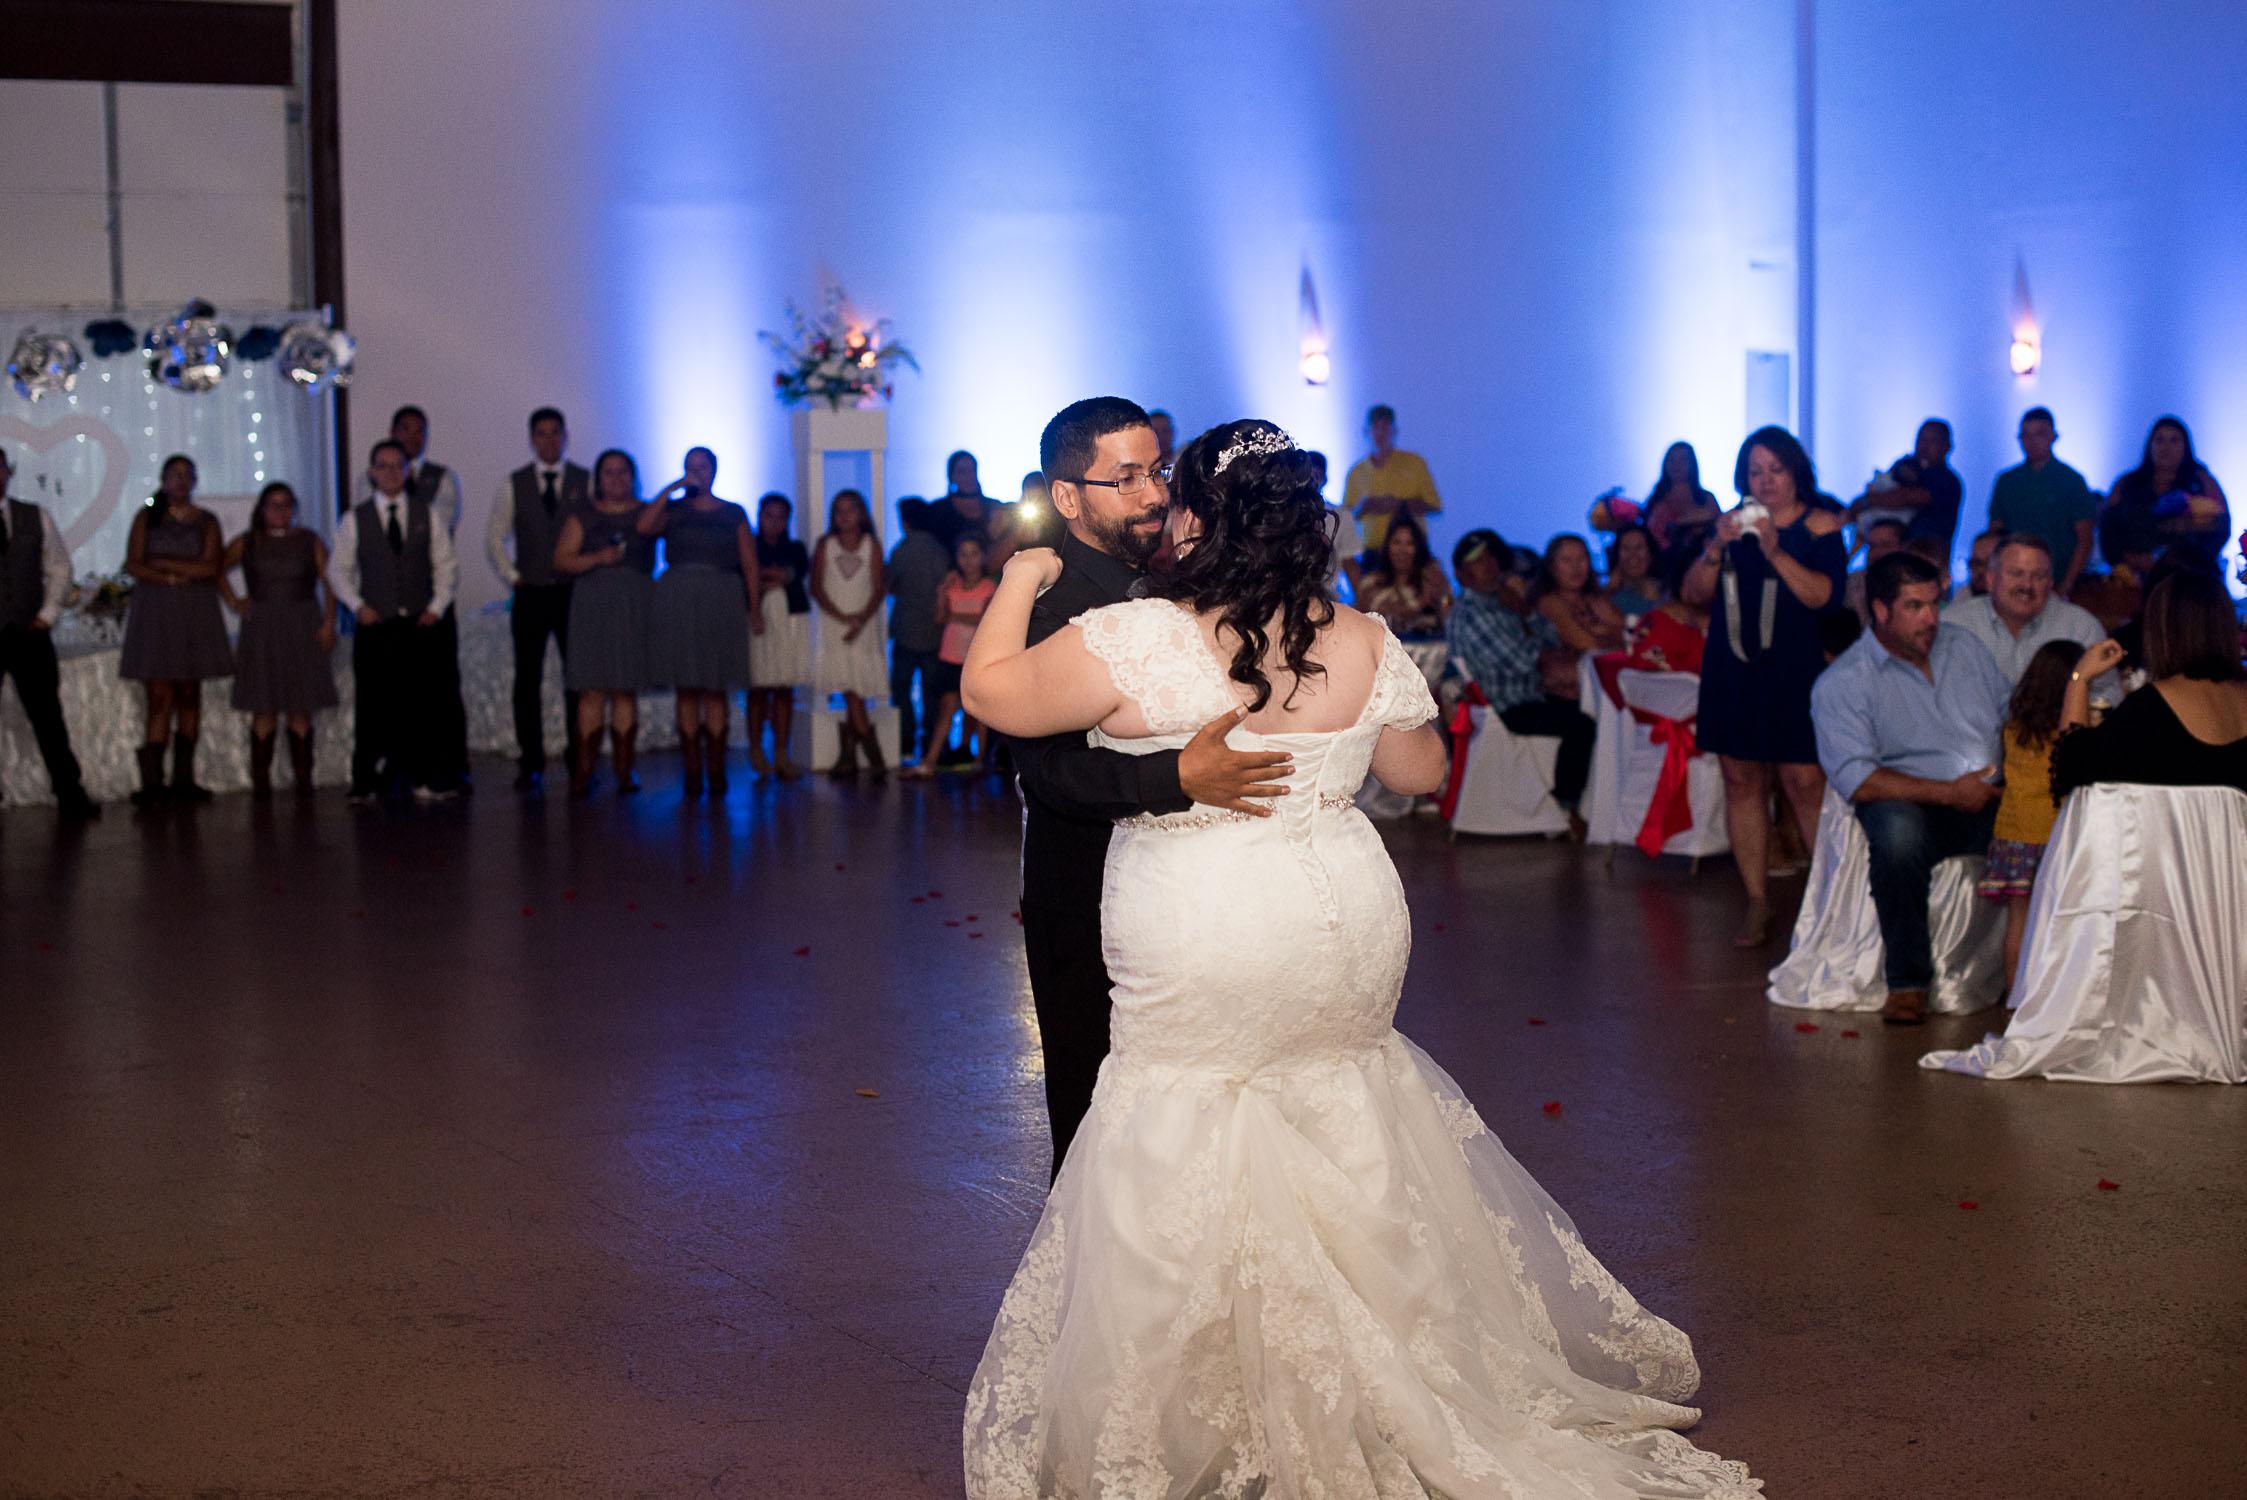 Leal Wedding Mira Visu Photography-150.jpg